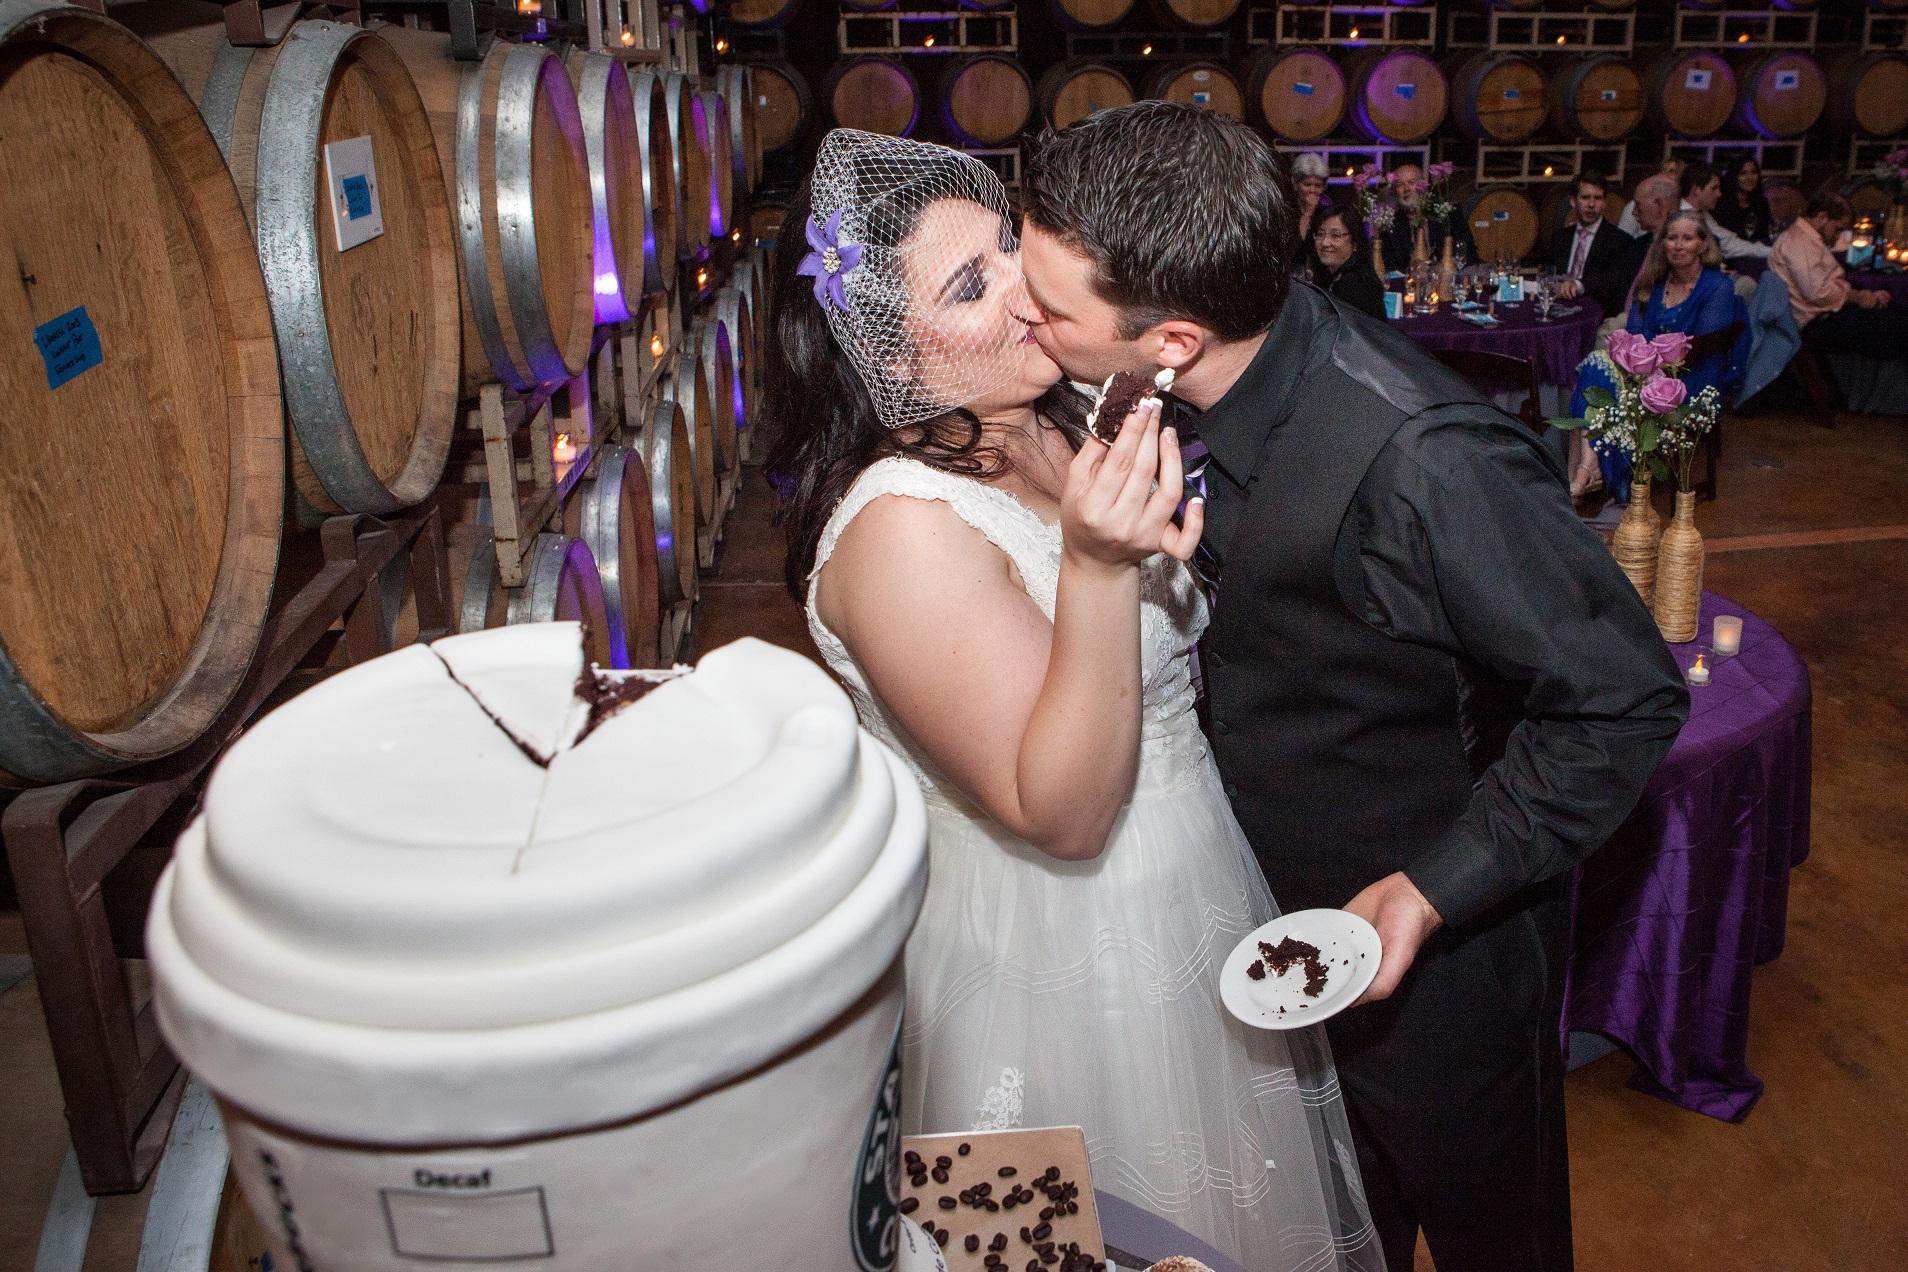 starbucks-coffee-cup-cake-cuttting-websize-marshall-wedding-photo-by-studio-512-copy